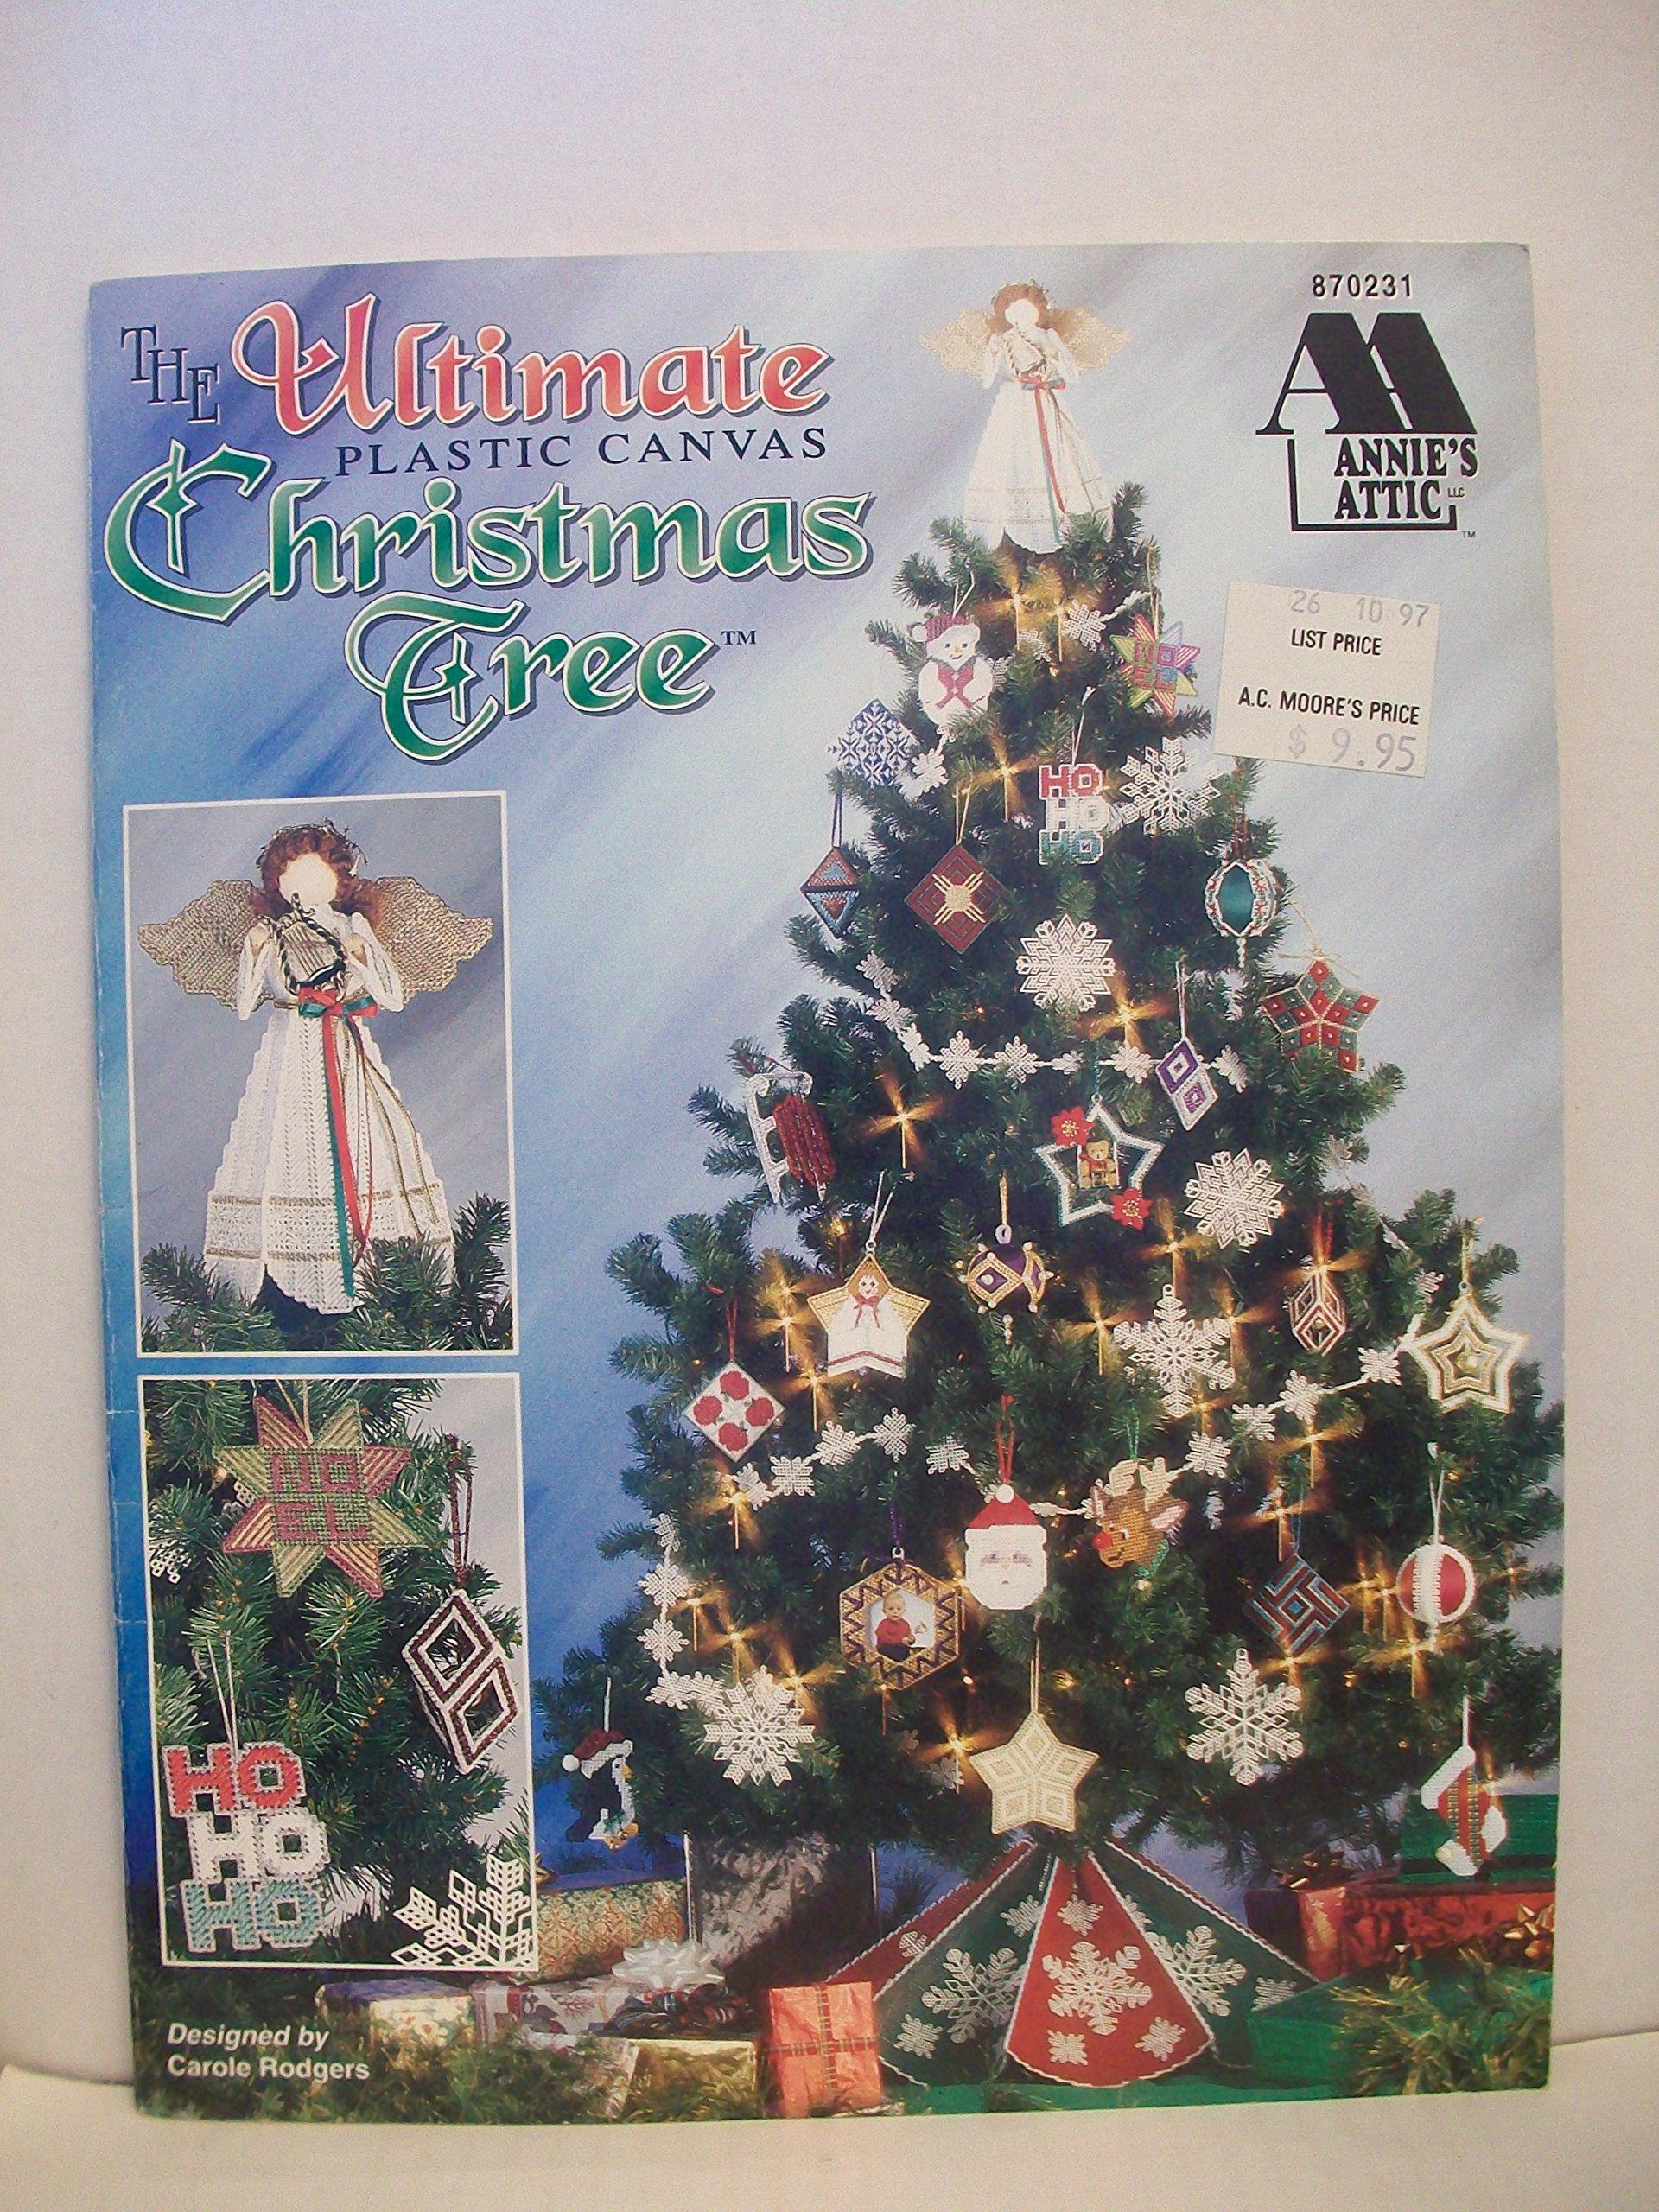 Plastic Canvas Christmas.The Ultimate Plastic Canvas Christmas Tree Carole Rodgers